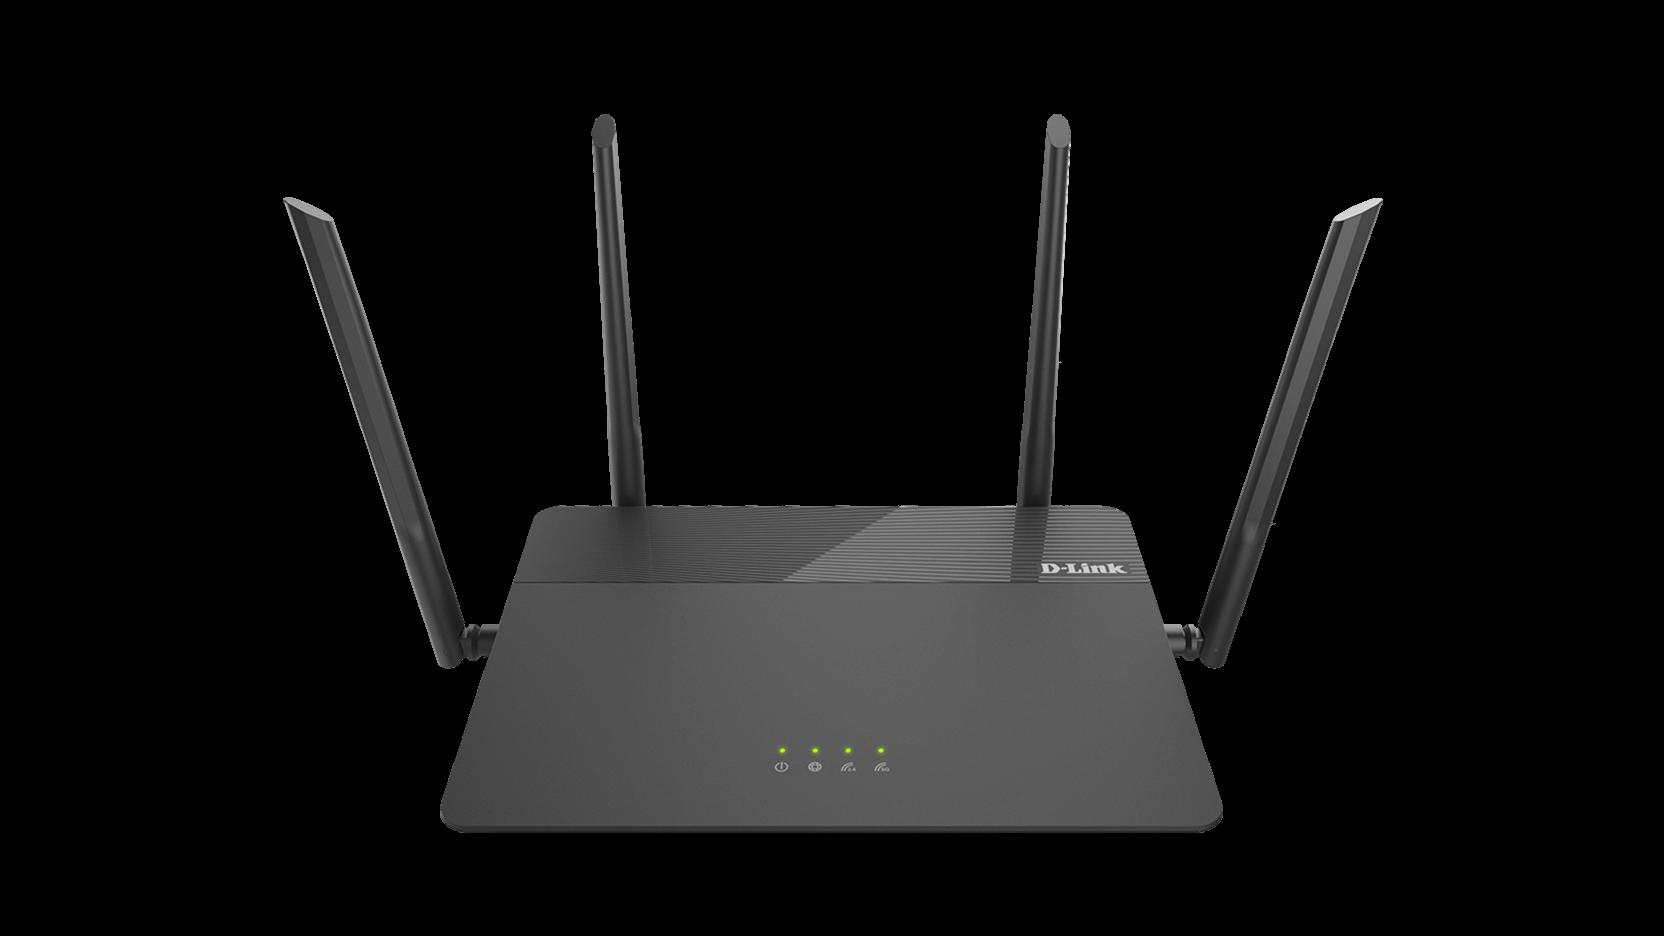 D-Link DIR-878/MT AC1900 MU-MIMO WiFI Gigabit Rout - DIR-878/MT